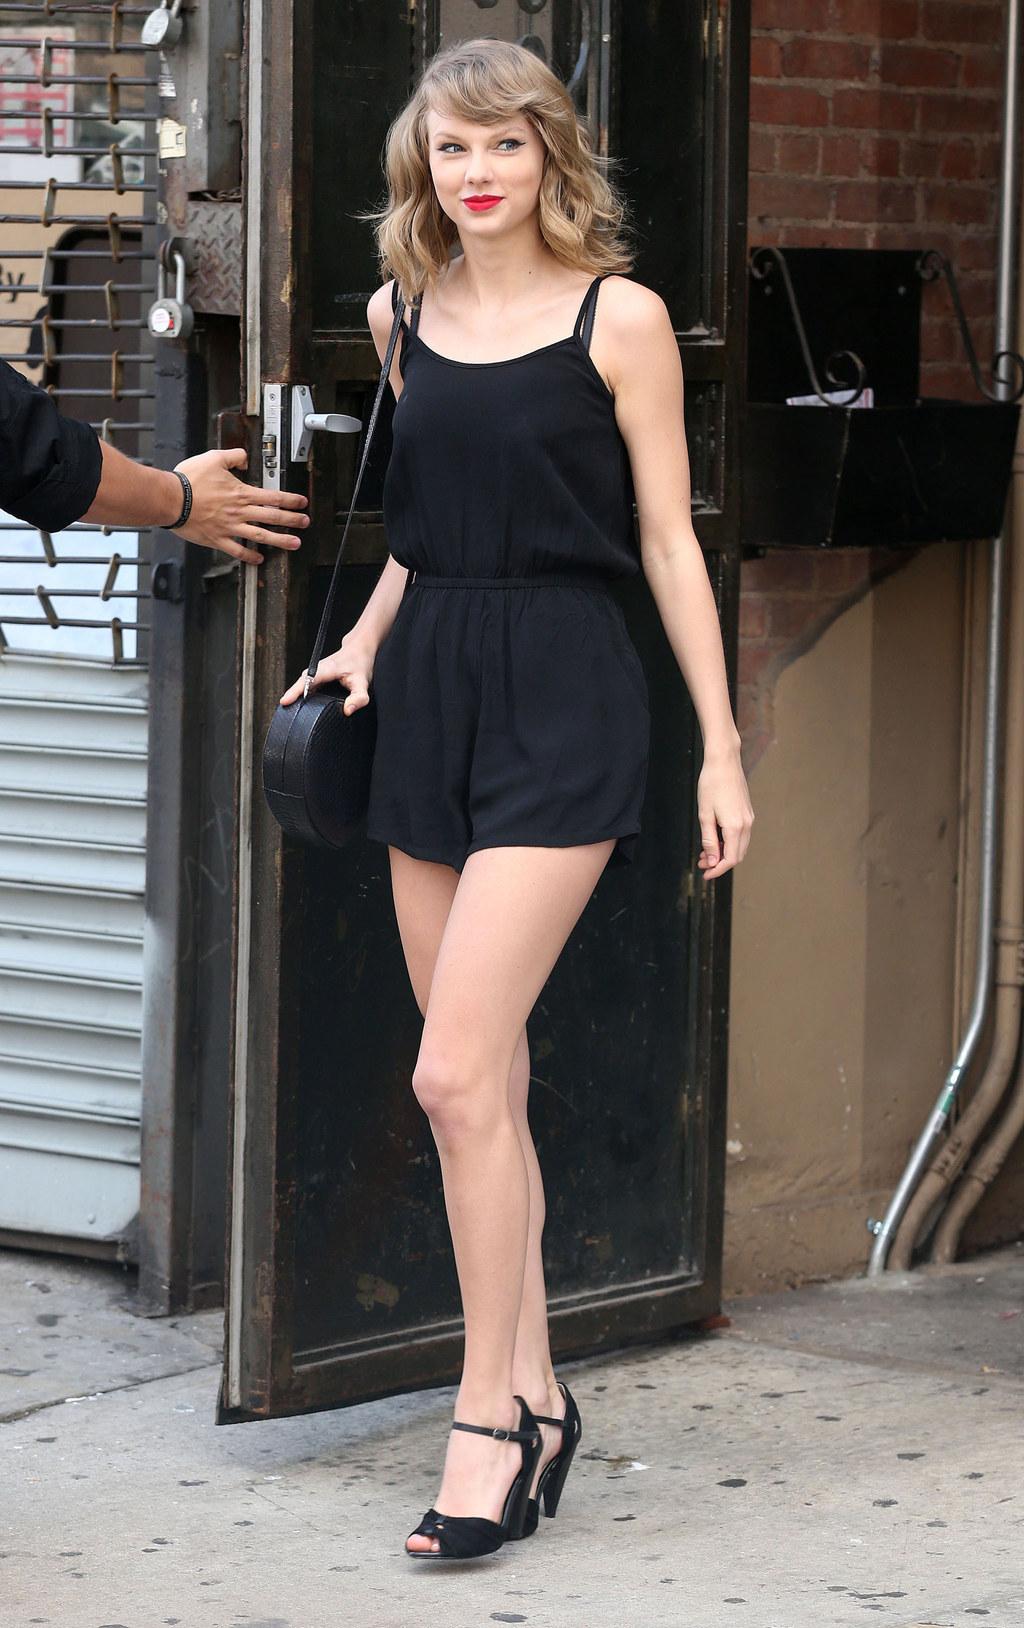 Taylor Swift Pussy Slip